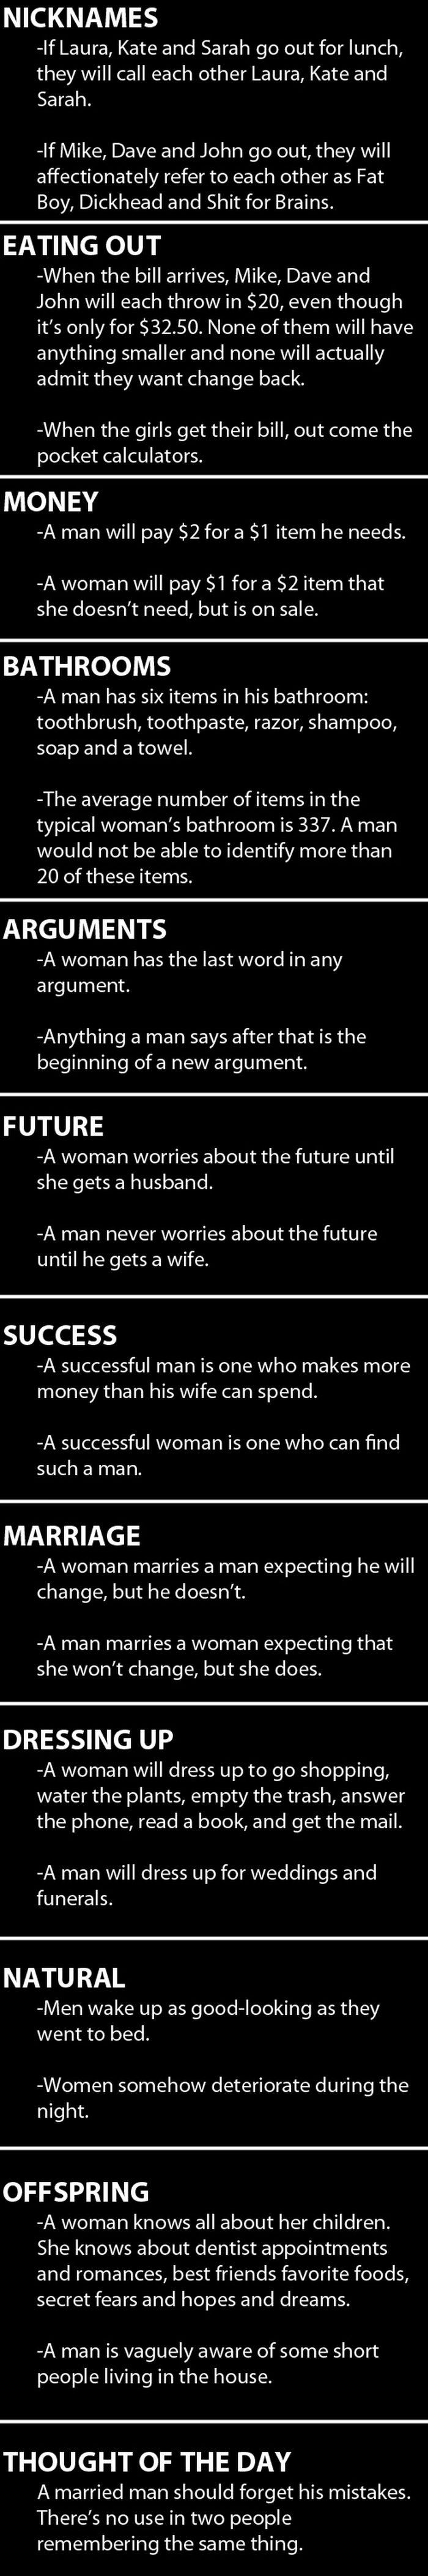 Men vs. Women (2 pics)